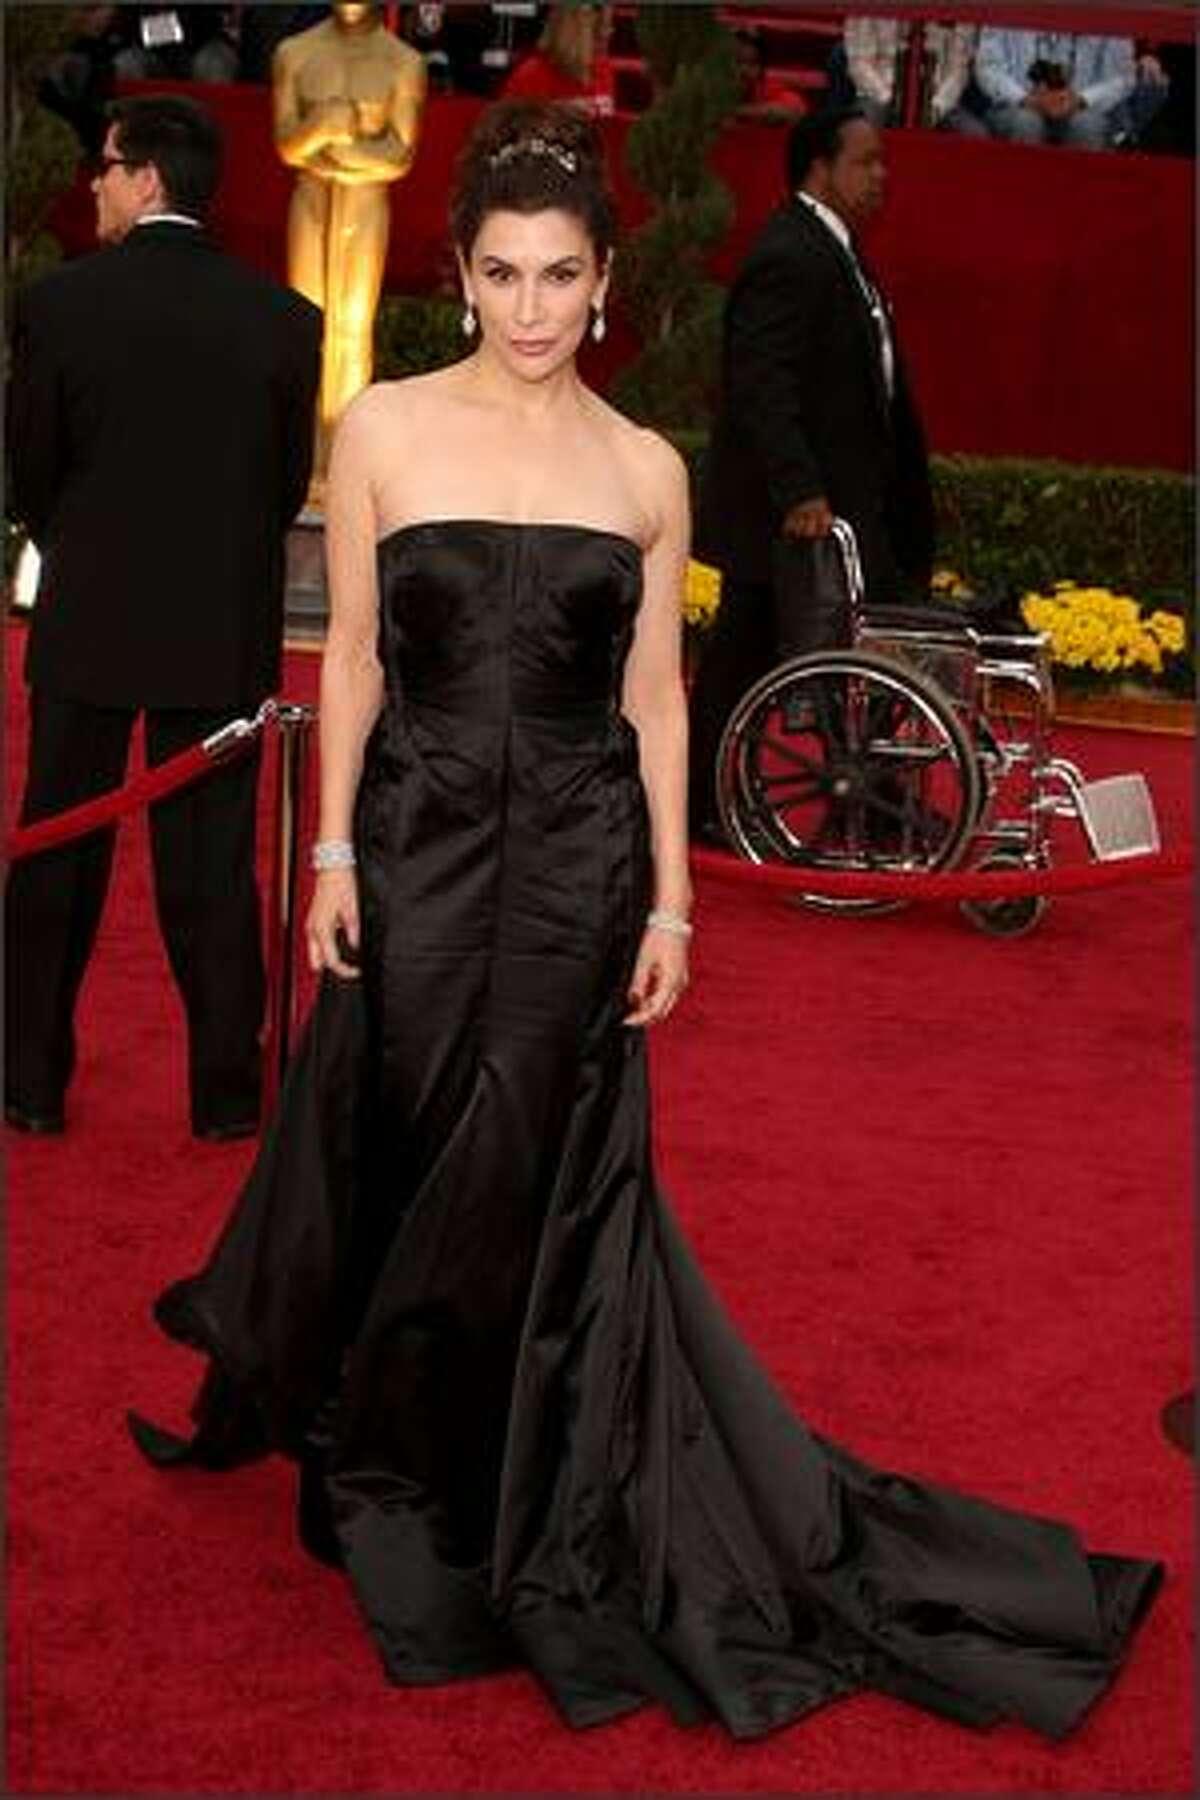 Actress Jo Champa shows how to wear a tiara.